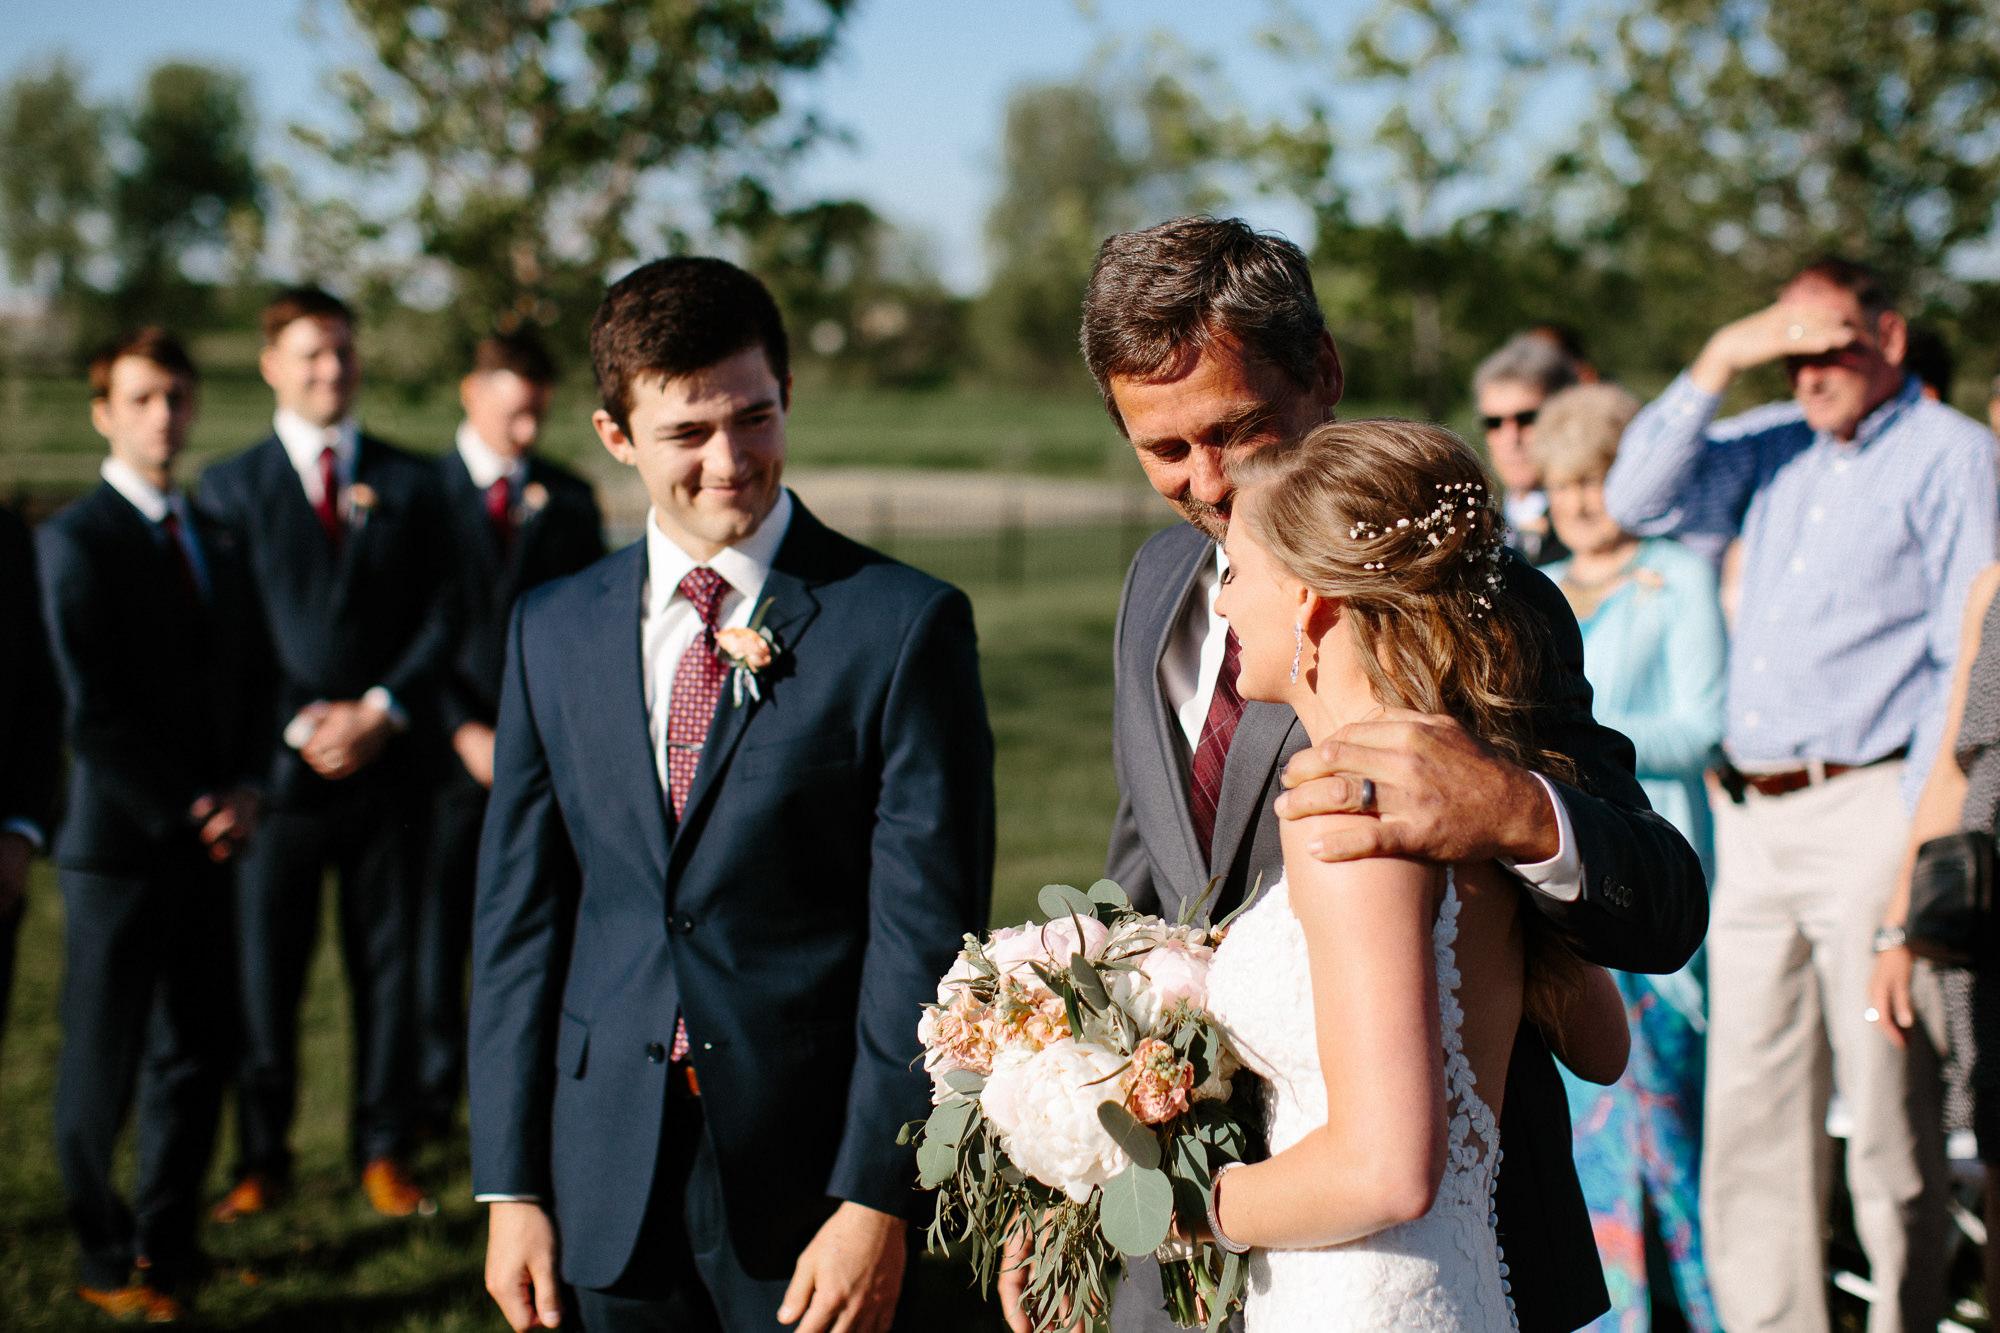 wedding-elopement-adventerous-romantic-timeless-south-dakota-blue-haven-barn-039.jpg